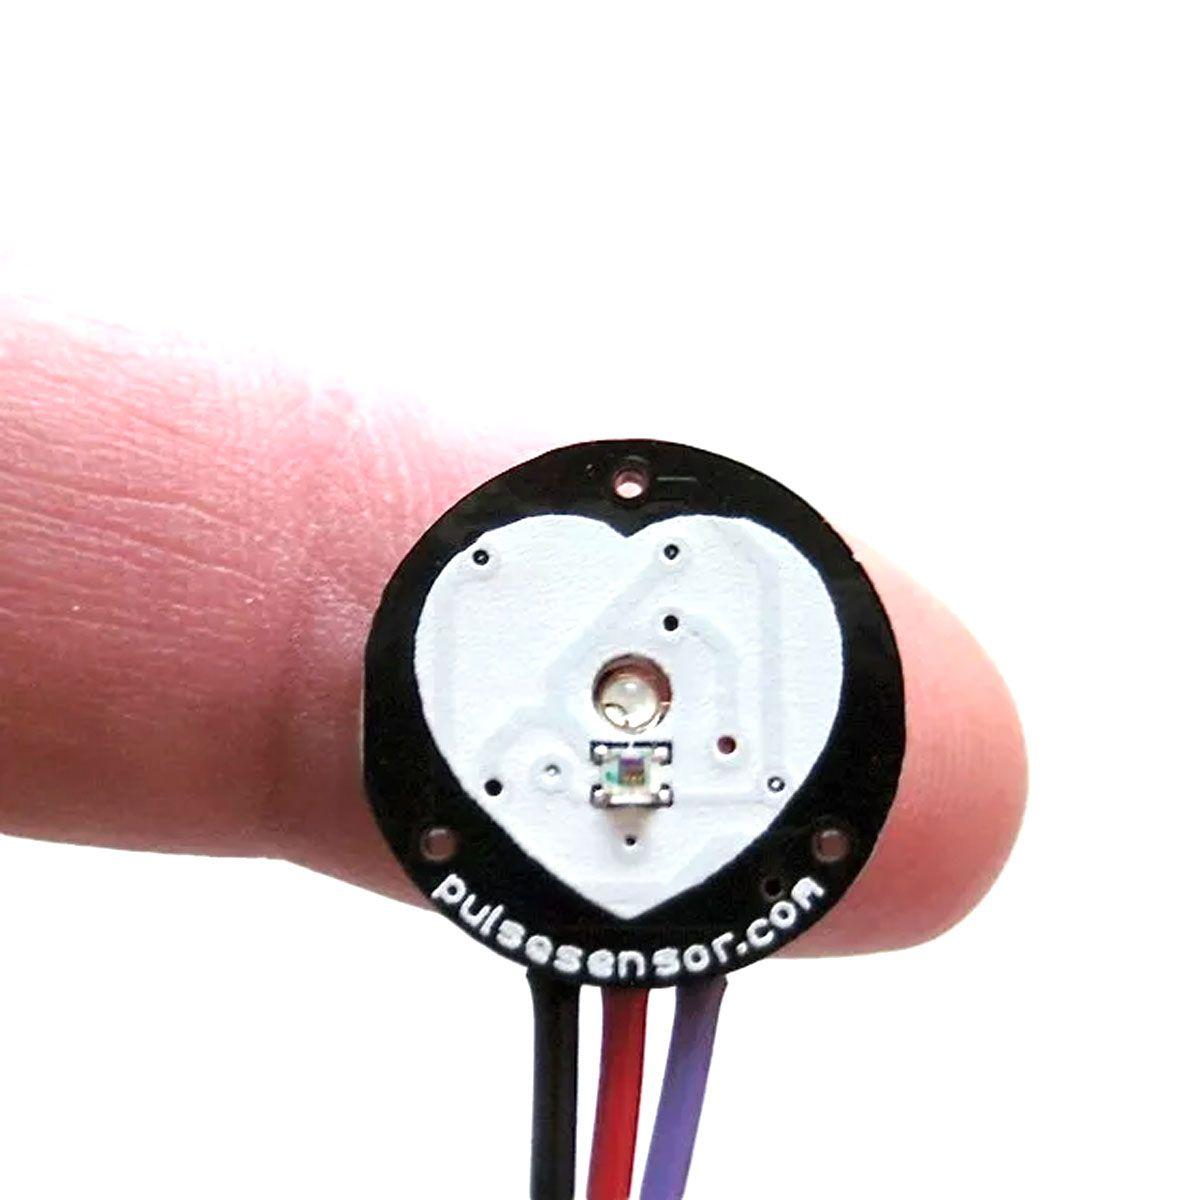 Sensor de Batimento Cardíaco / Monitor de Pulso